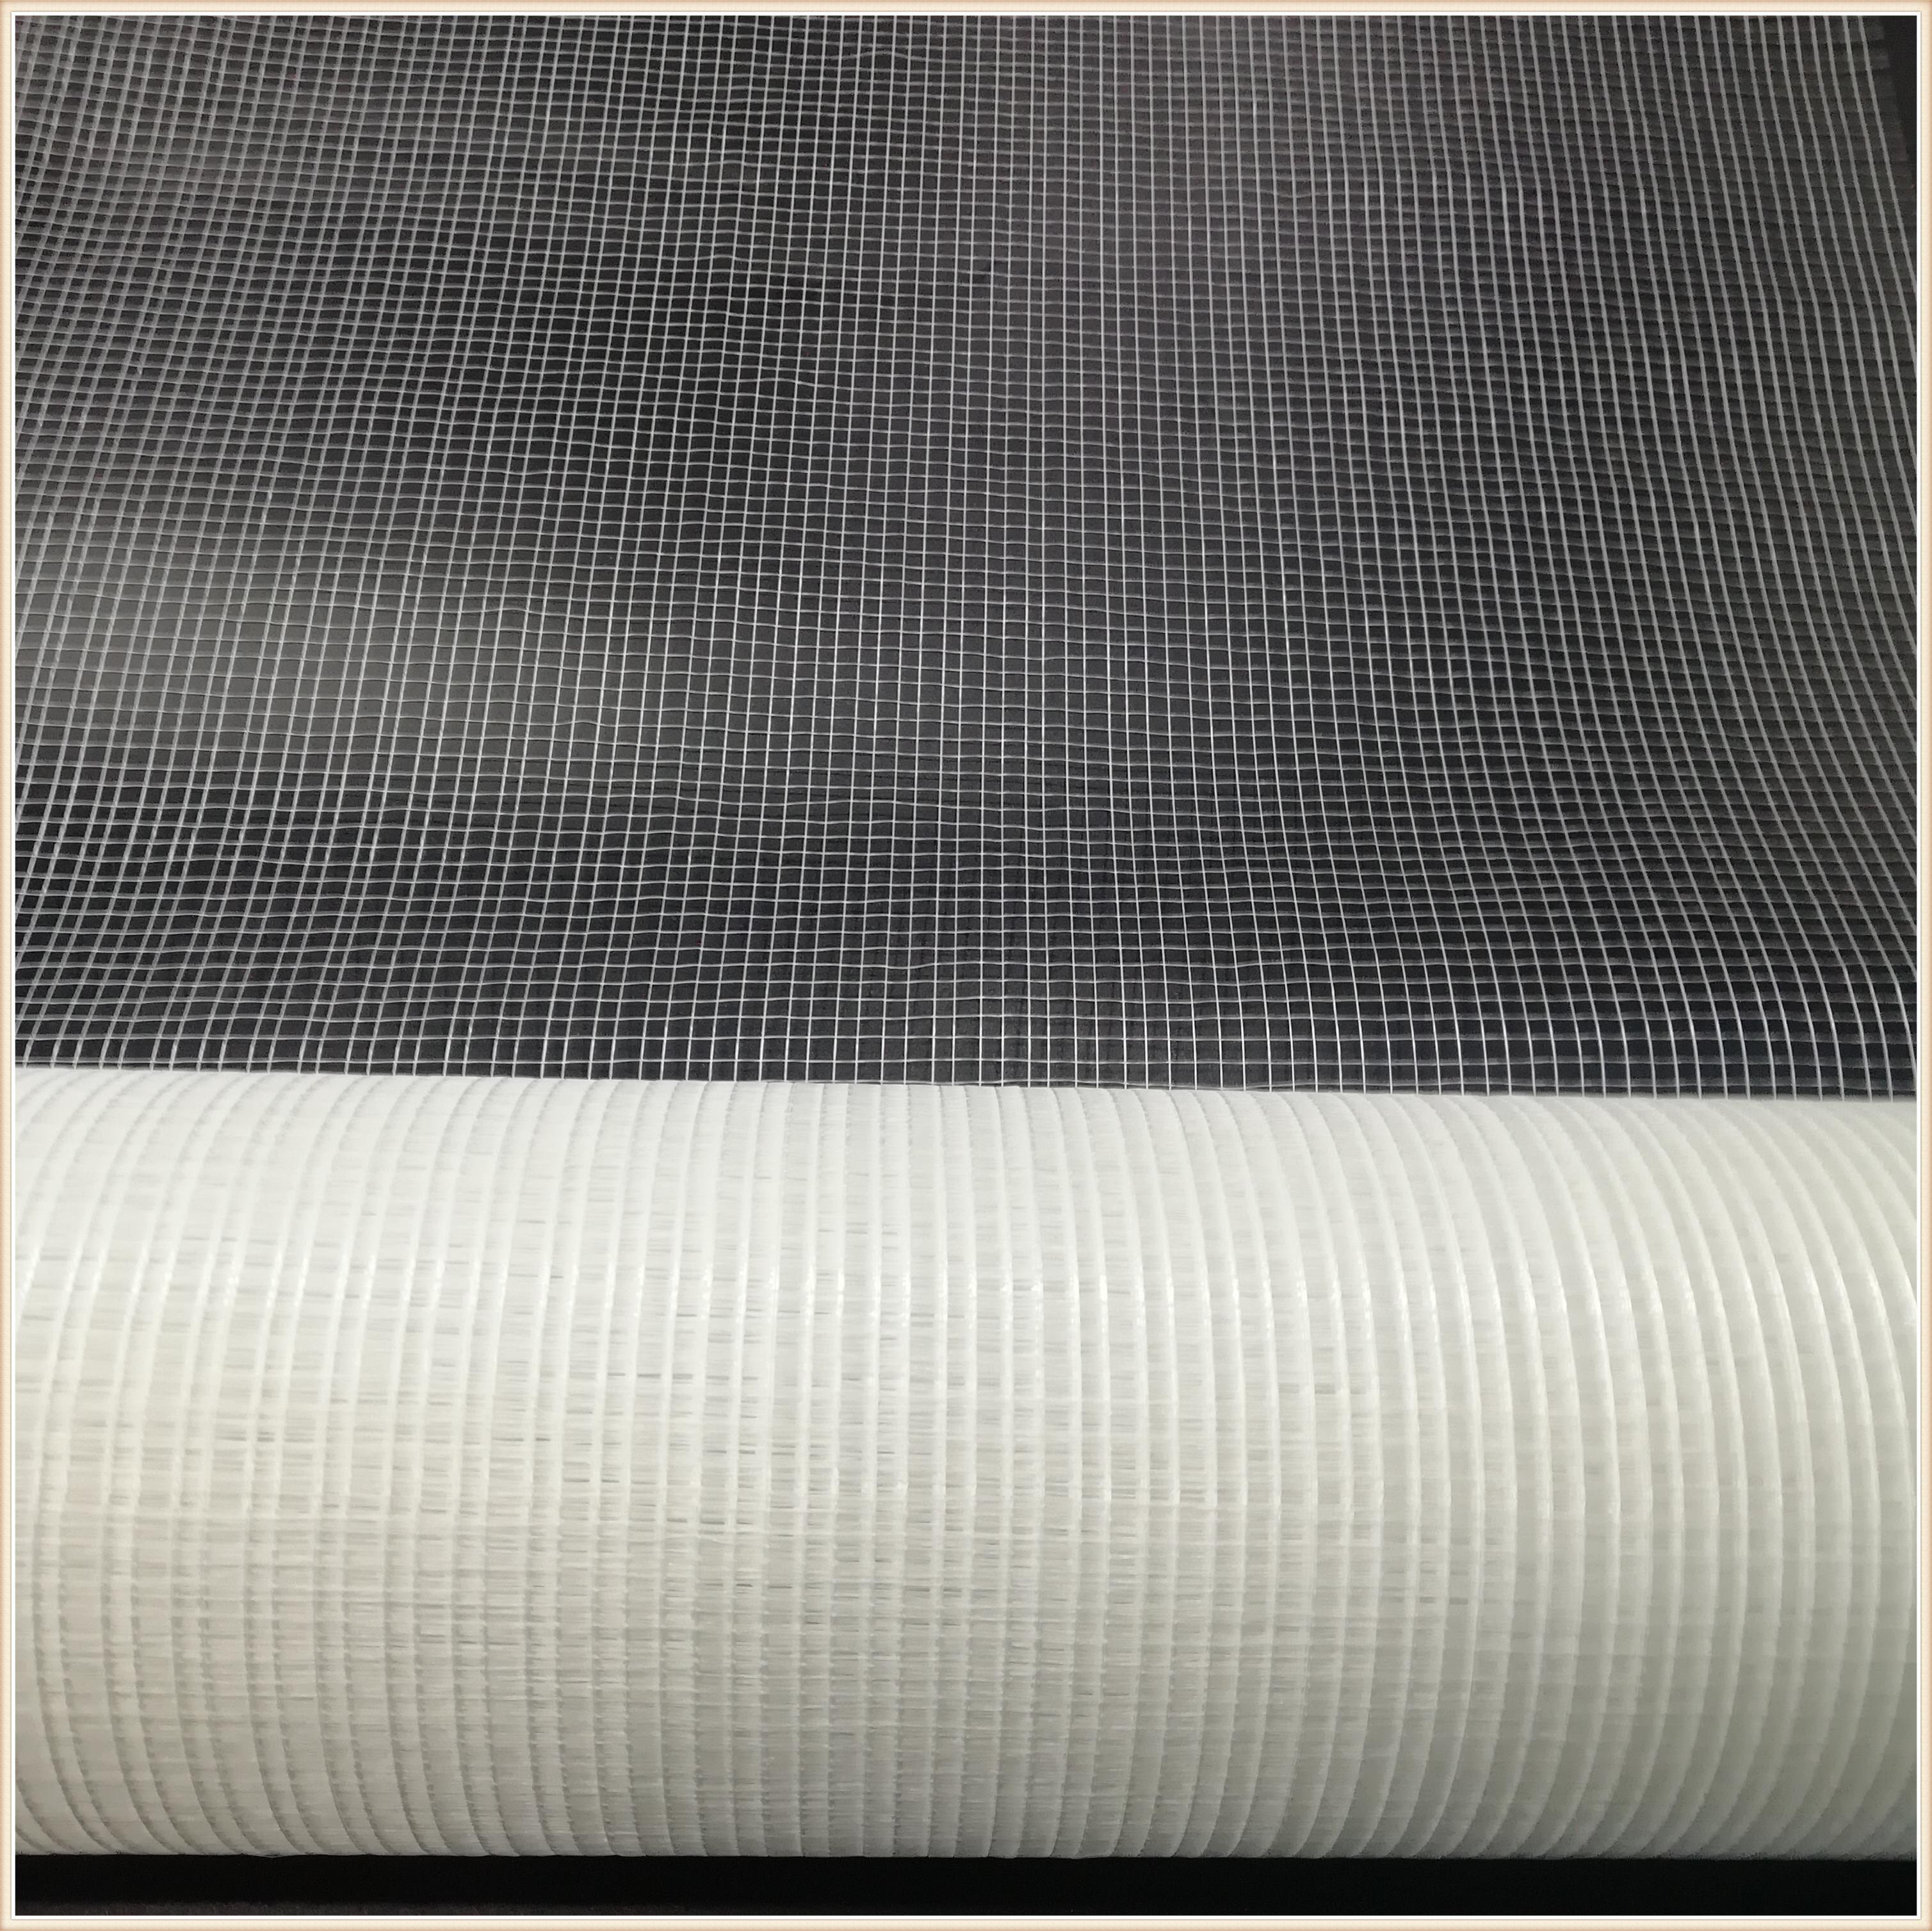 Customized fiberglass Laid Scrims Featured Image